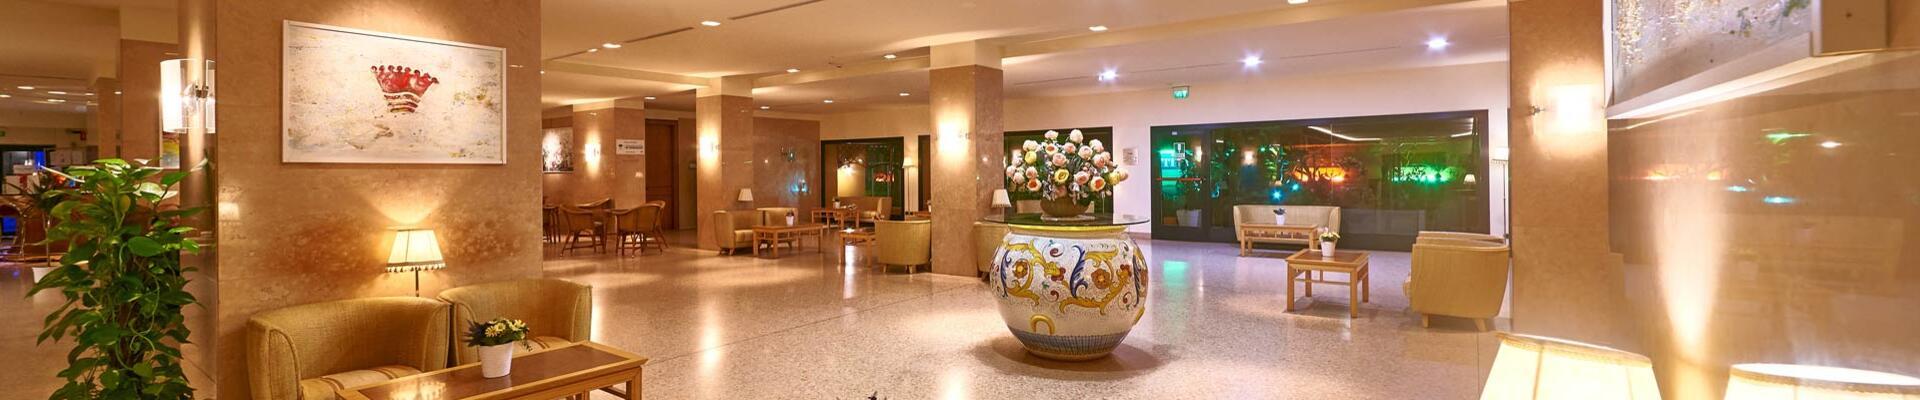 hotelreferdinandoischia it hotel 004